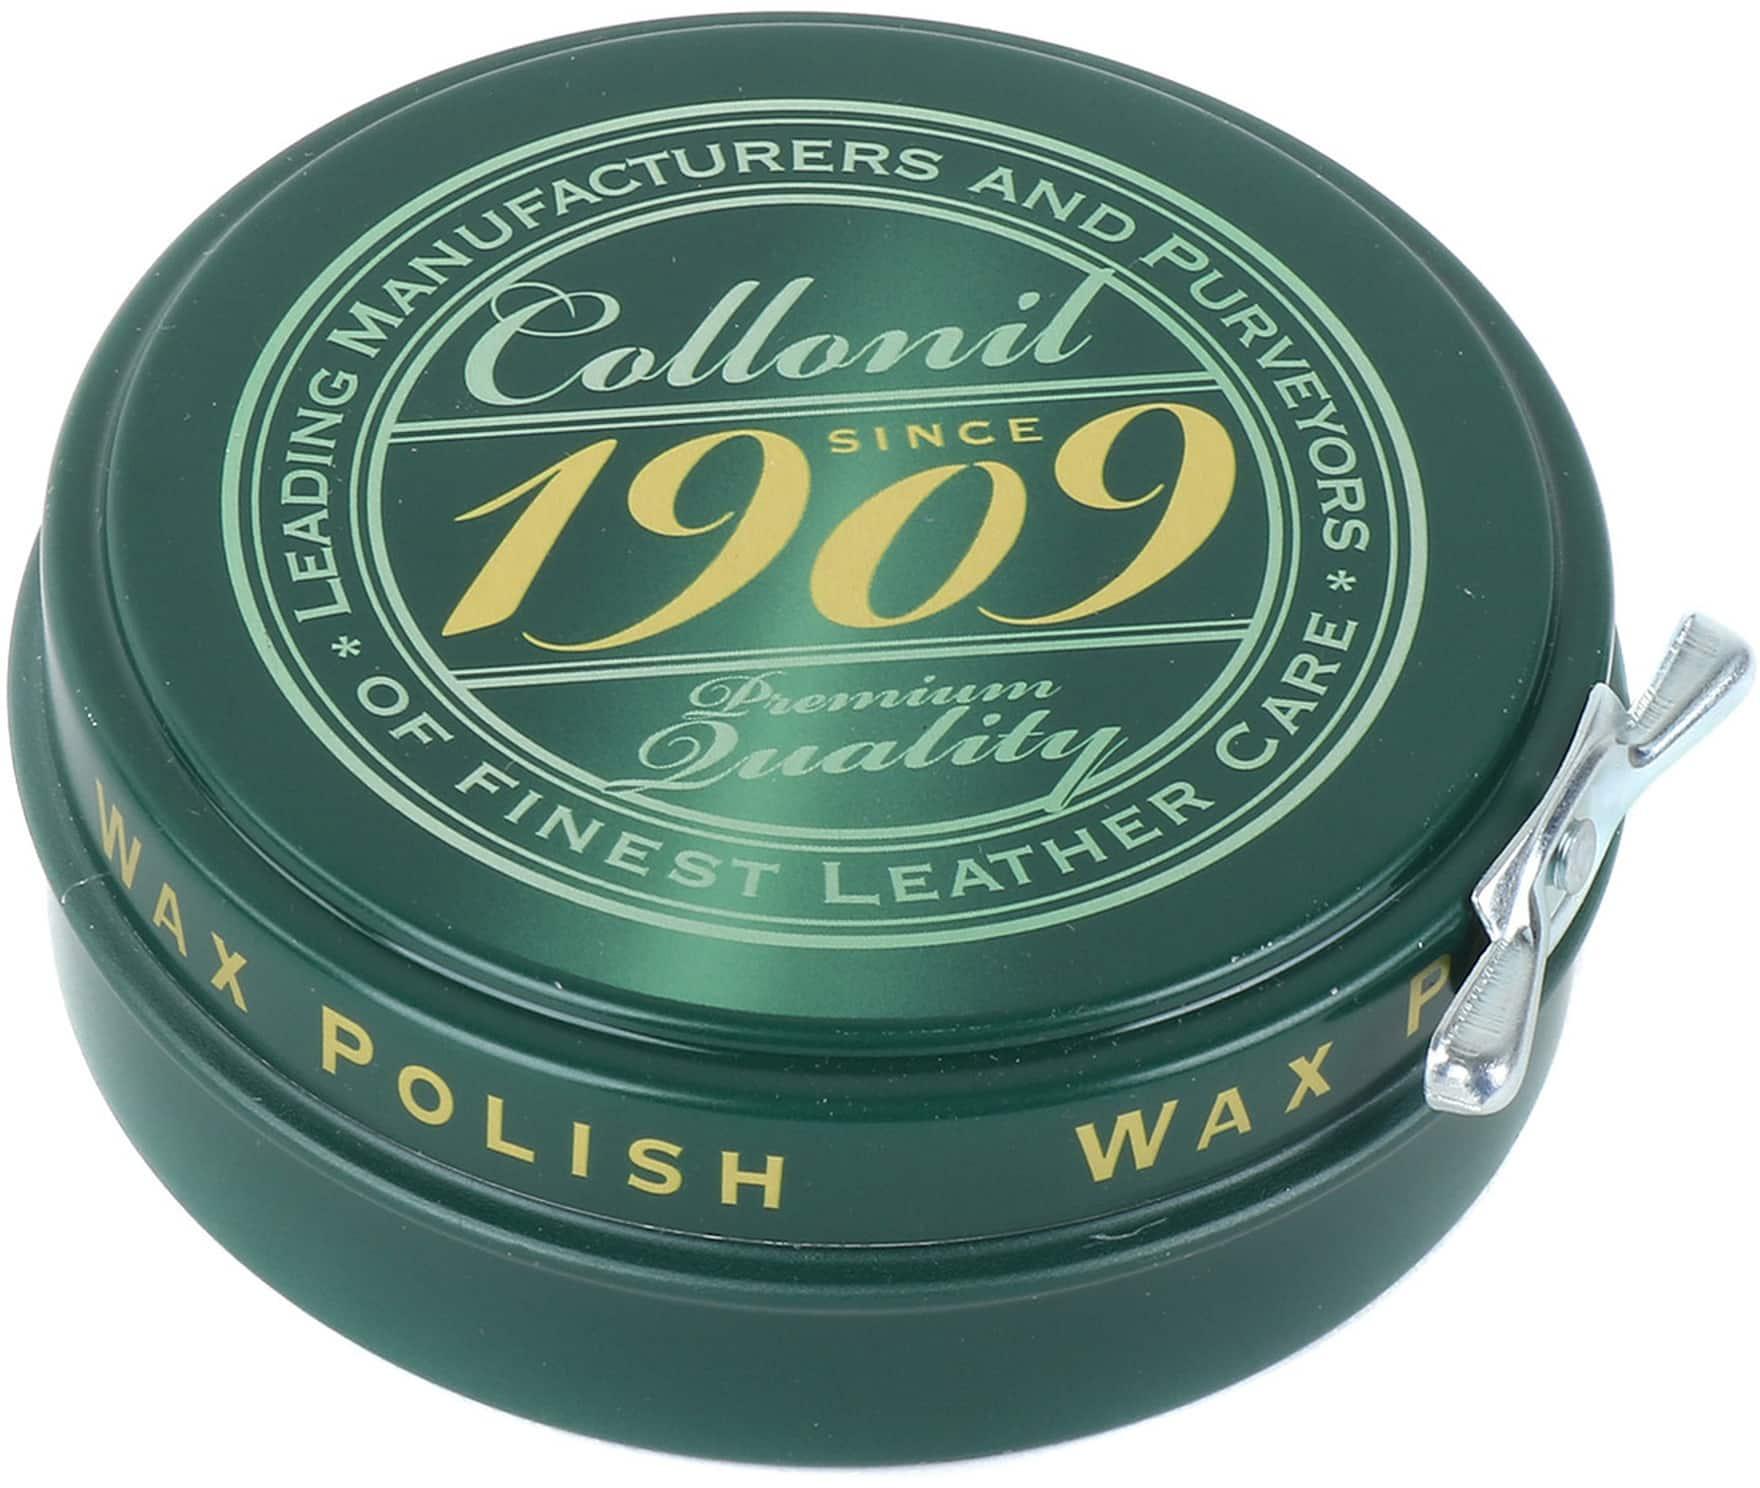 Collonil 1909 Wax Polish Brown foto 0